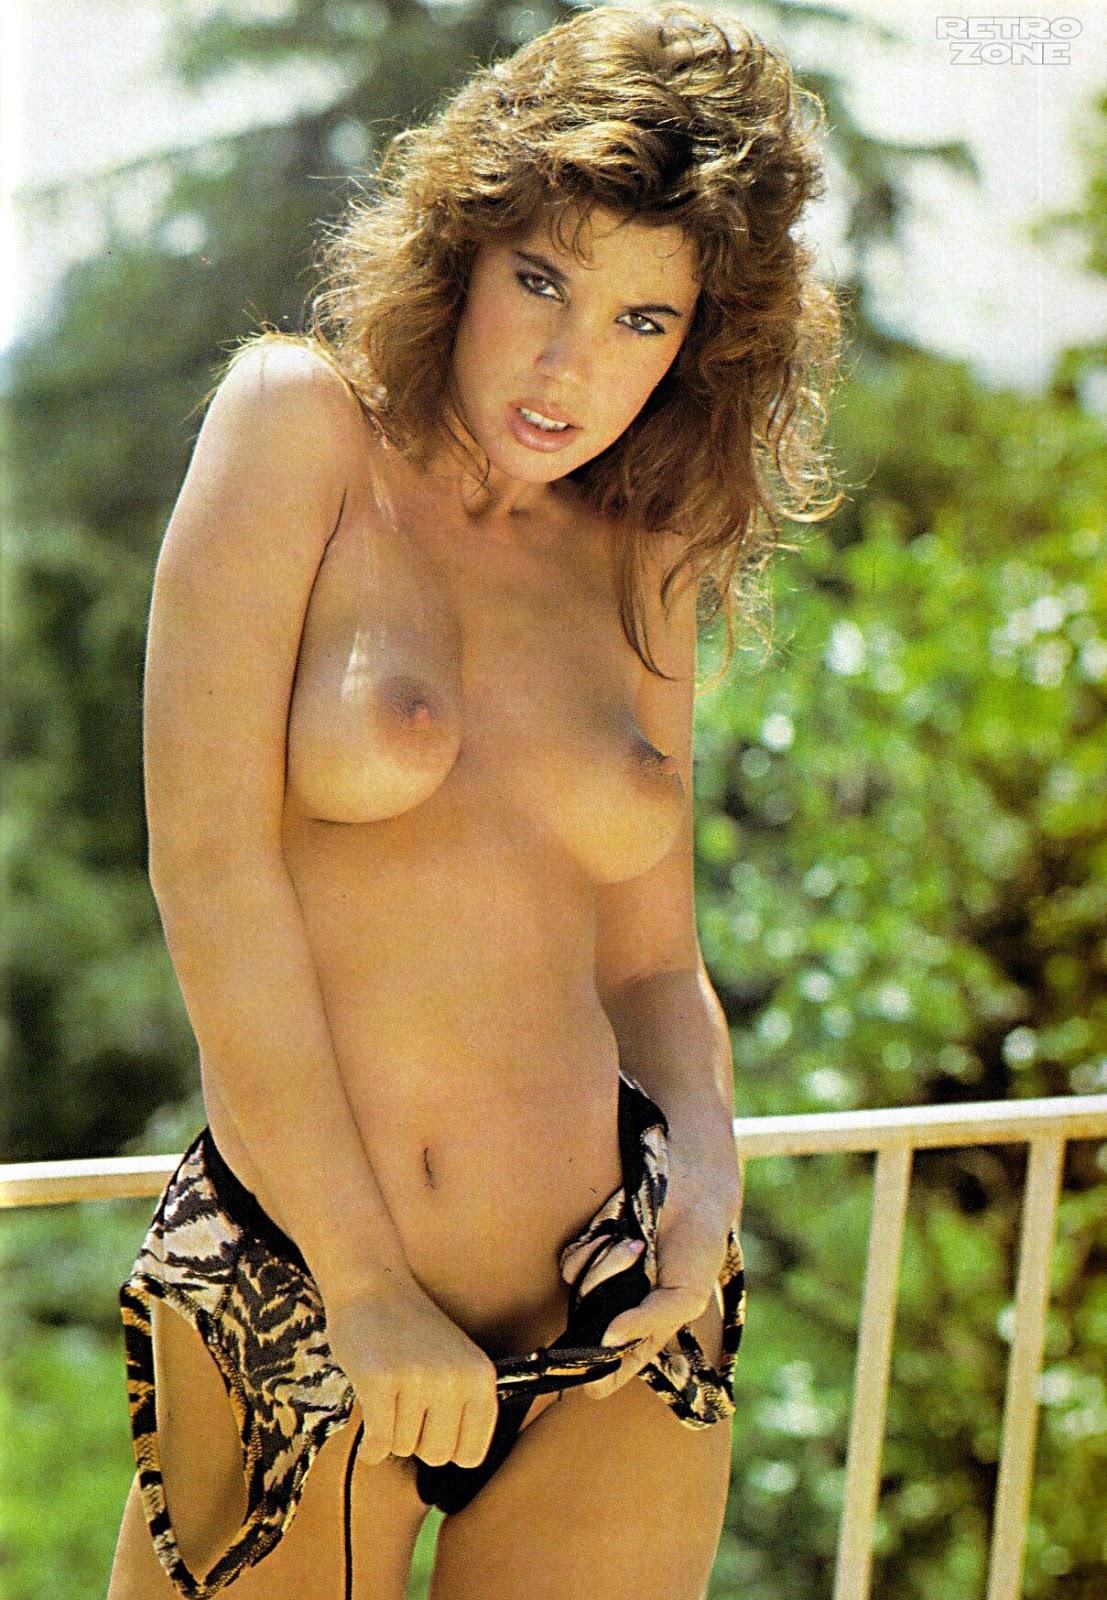 Jewel shepard breasts scene in party camp tnaflix porn pics